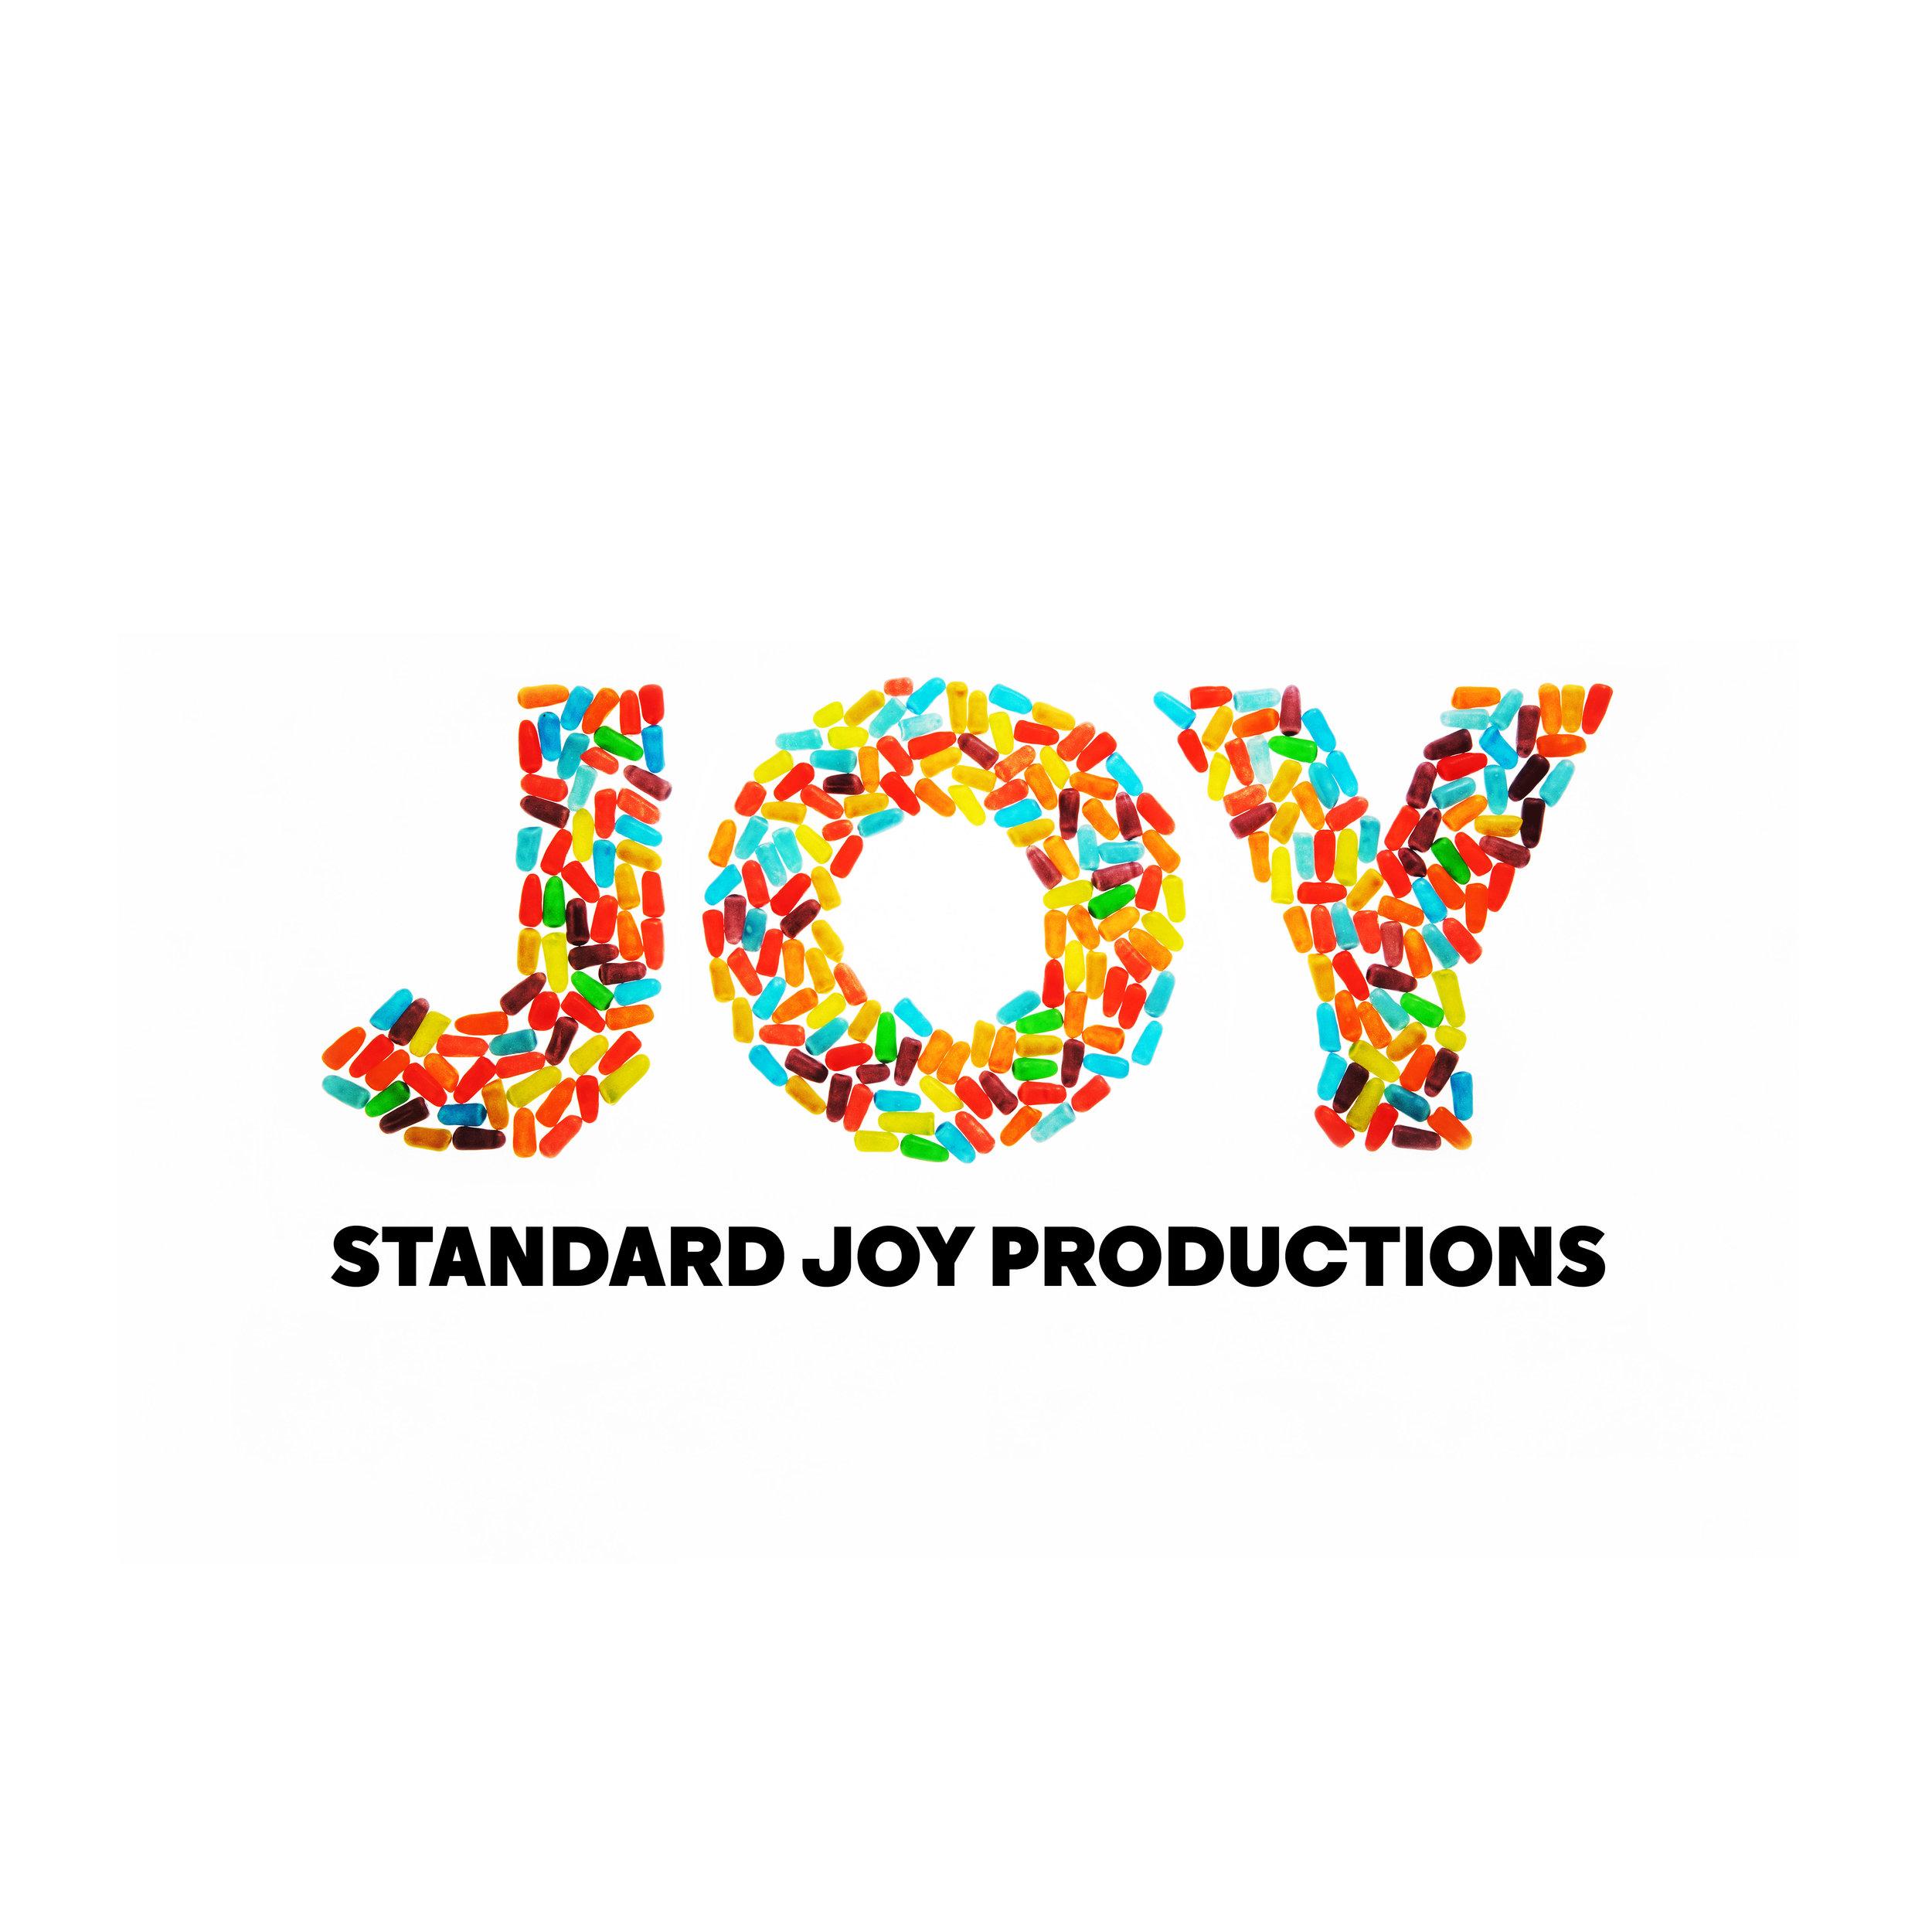 2019_0814_SJP_Logo_Business_NEW_fr_NEW_ORLEANS_WORLD PRIDE_Standard_Joy_PSD_v5_CLEAN.jpg